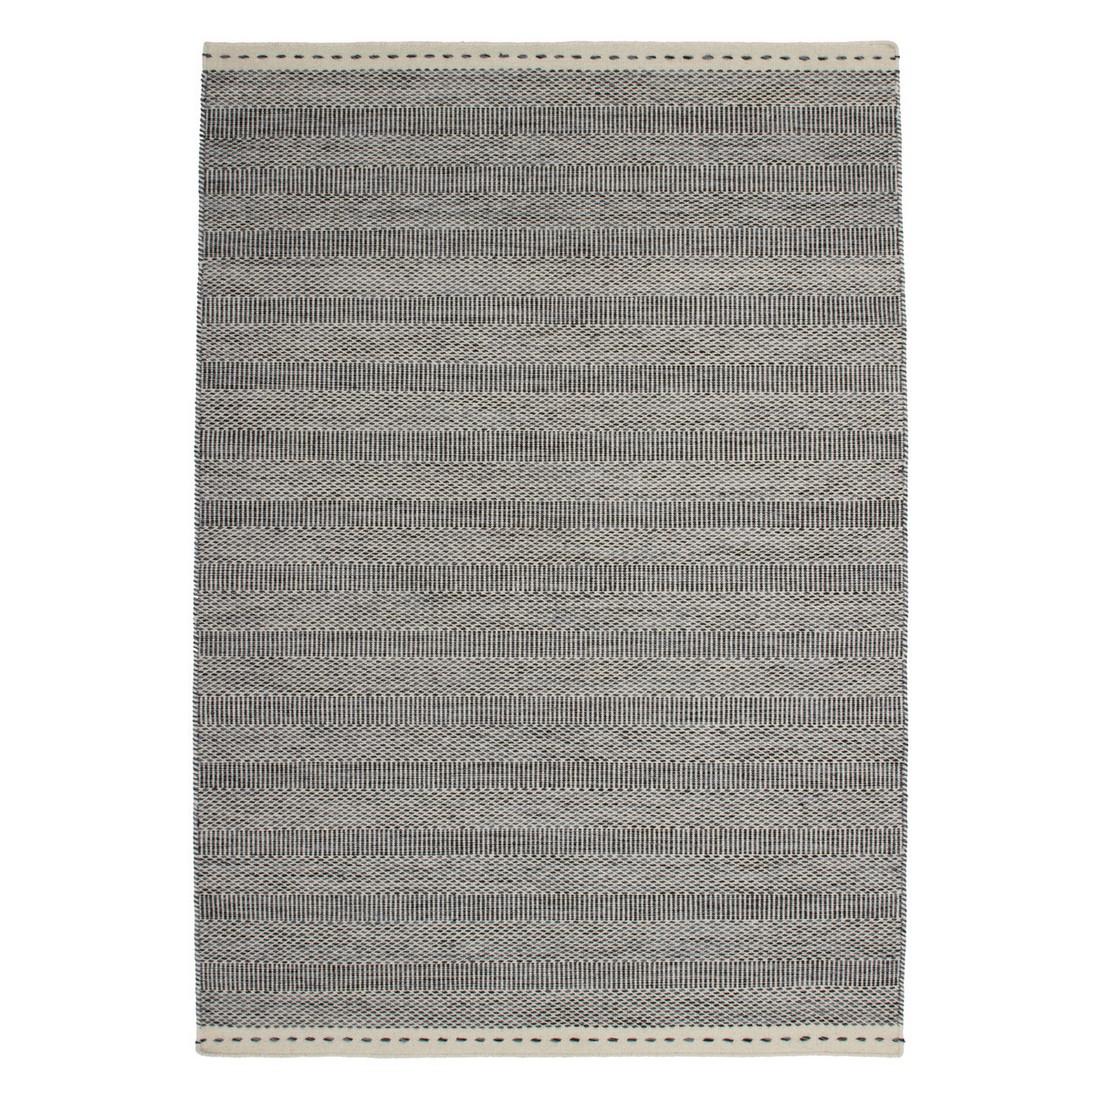 Teppich Bombay – Grau – 200 x 290 cm, Obsession online kaufen